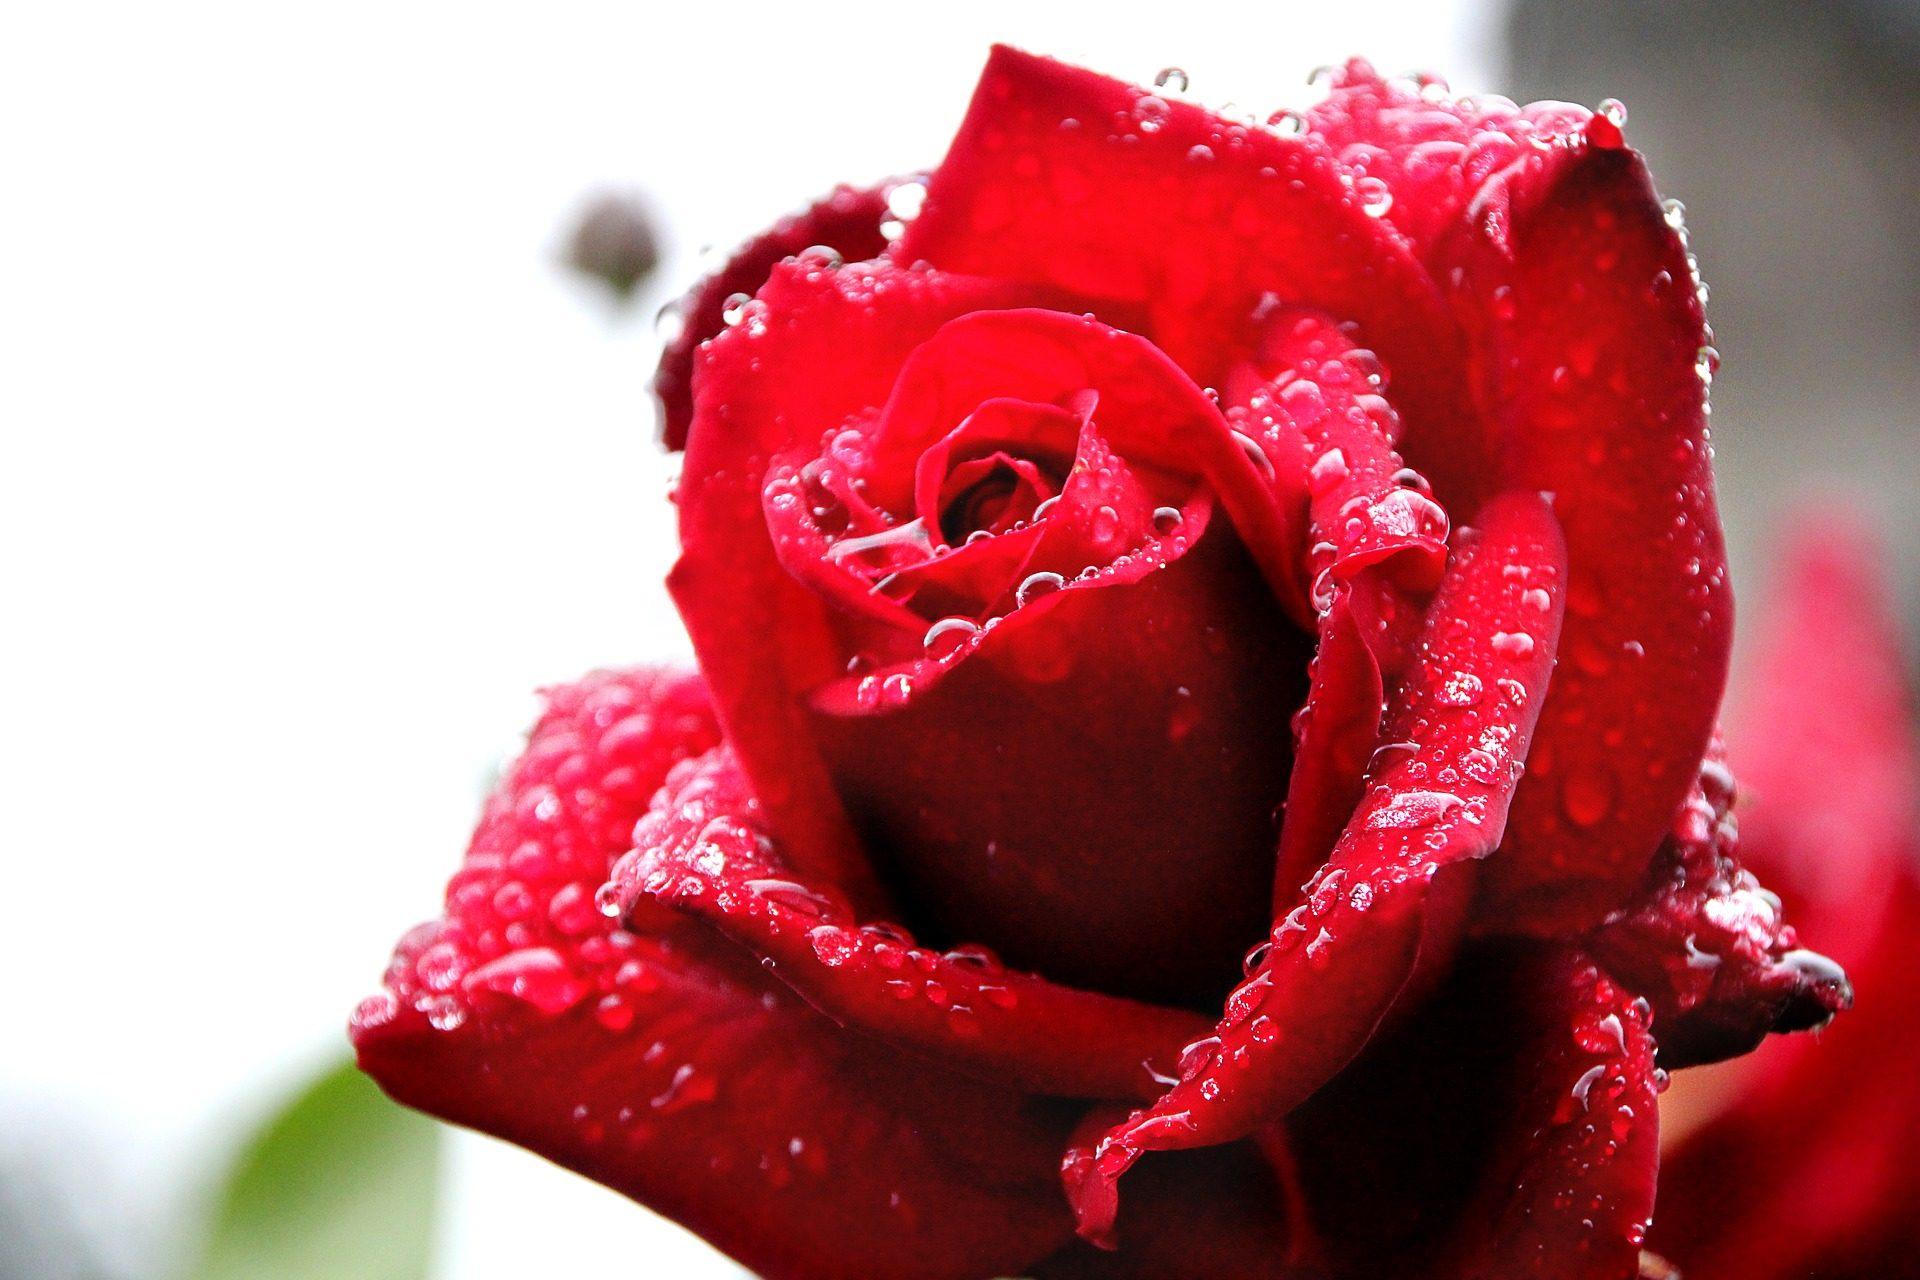 Rosa, fleur, Rocío, DROPS numéro, eau, pétales, Rouge - Fonds d'écran HD - Professor-falken.com